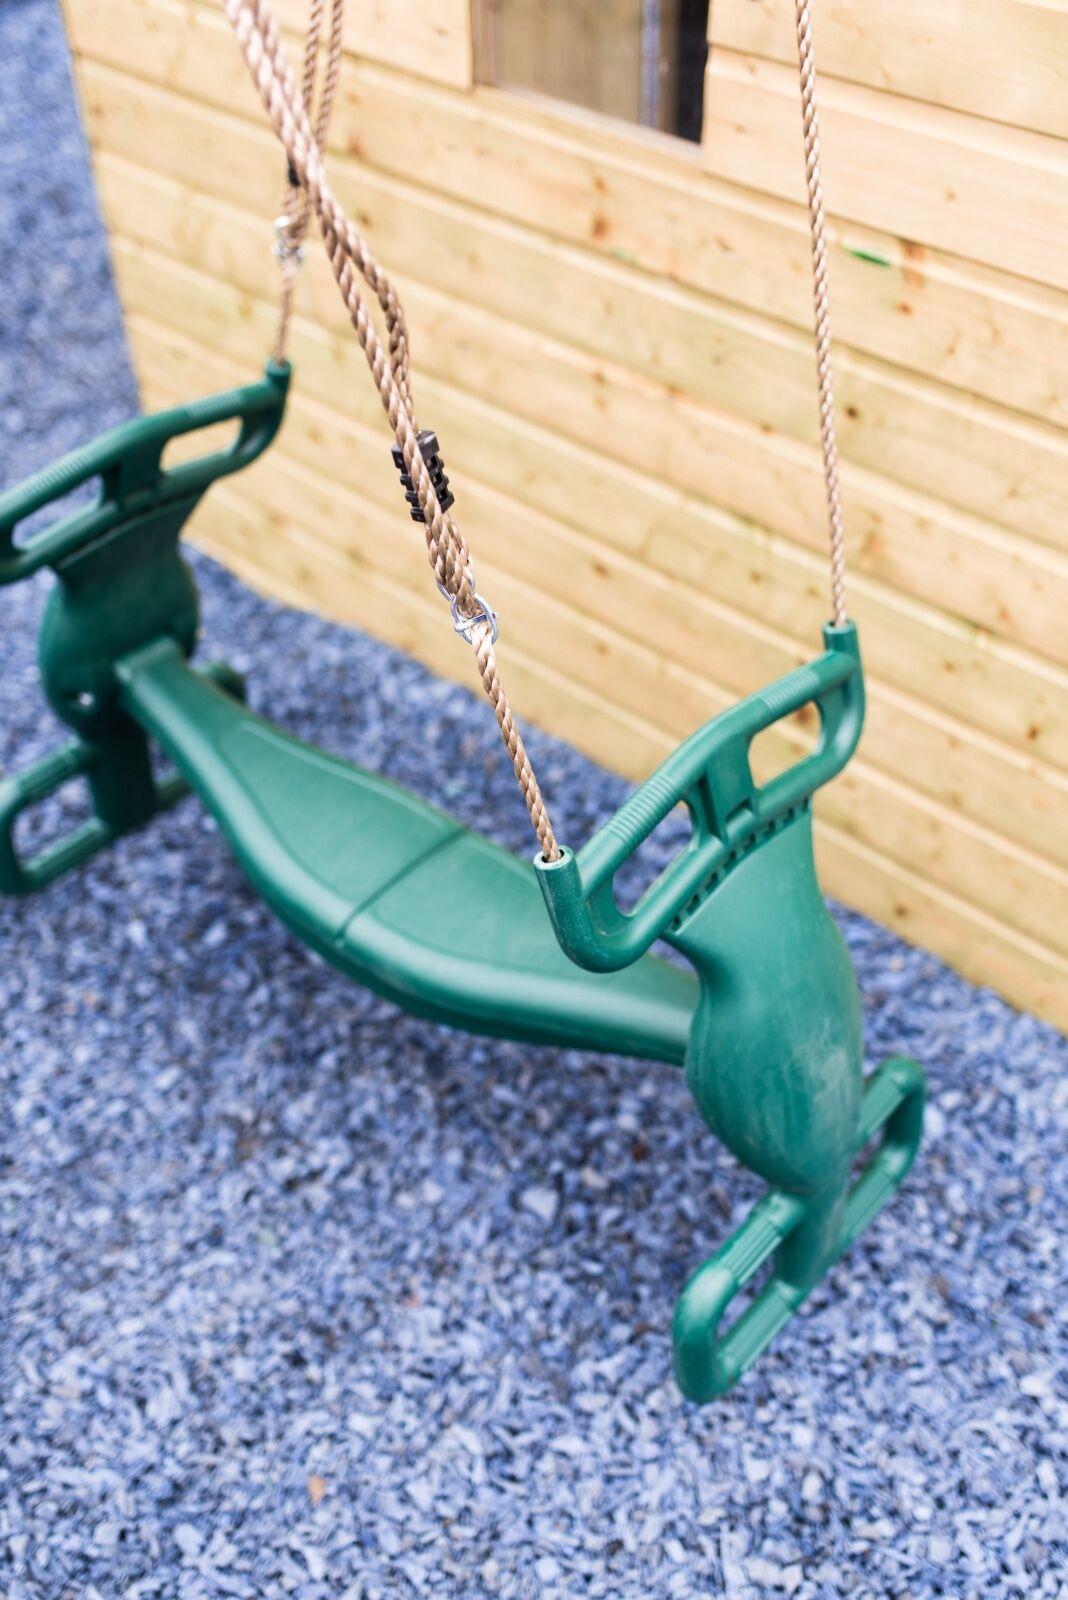 Plastic Green Glider Swing Duo Seat